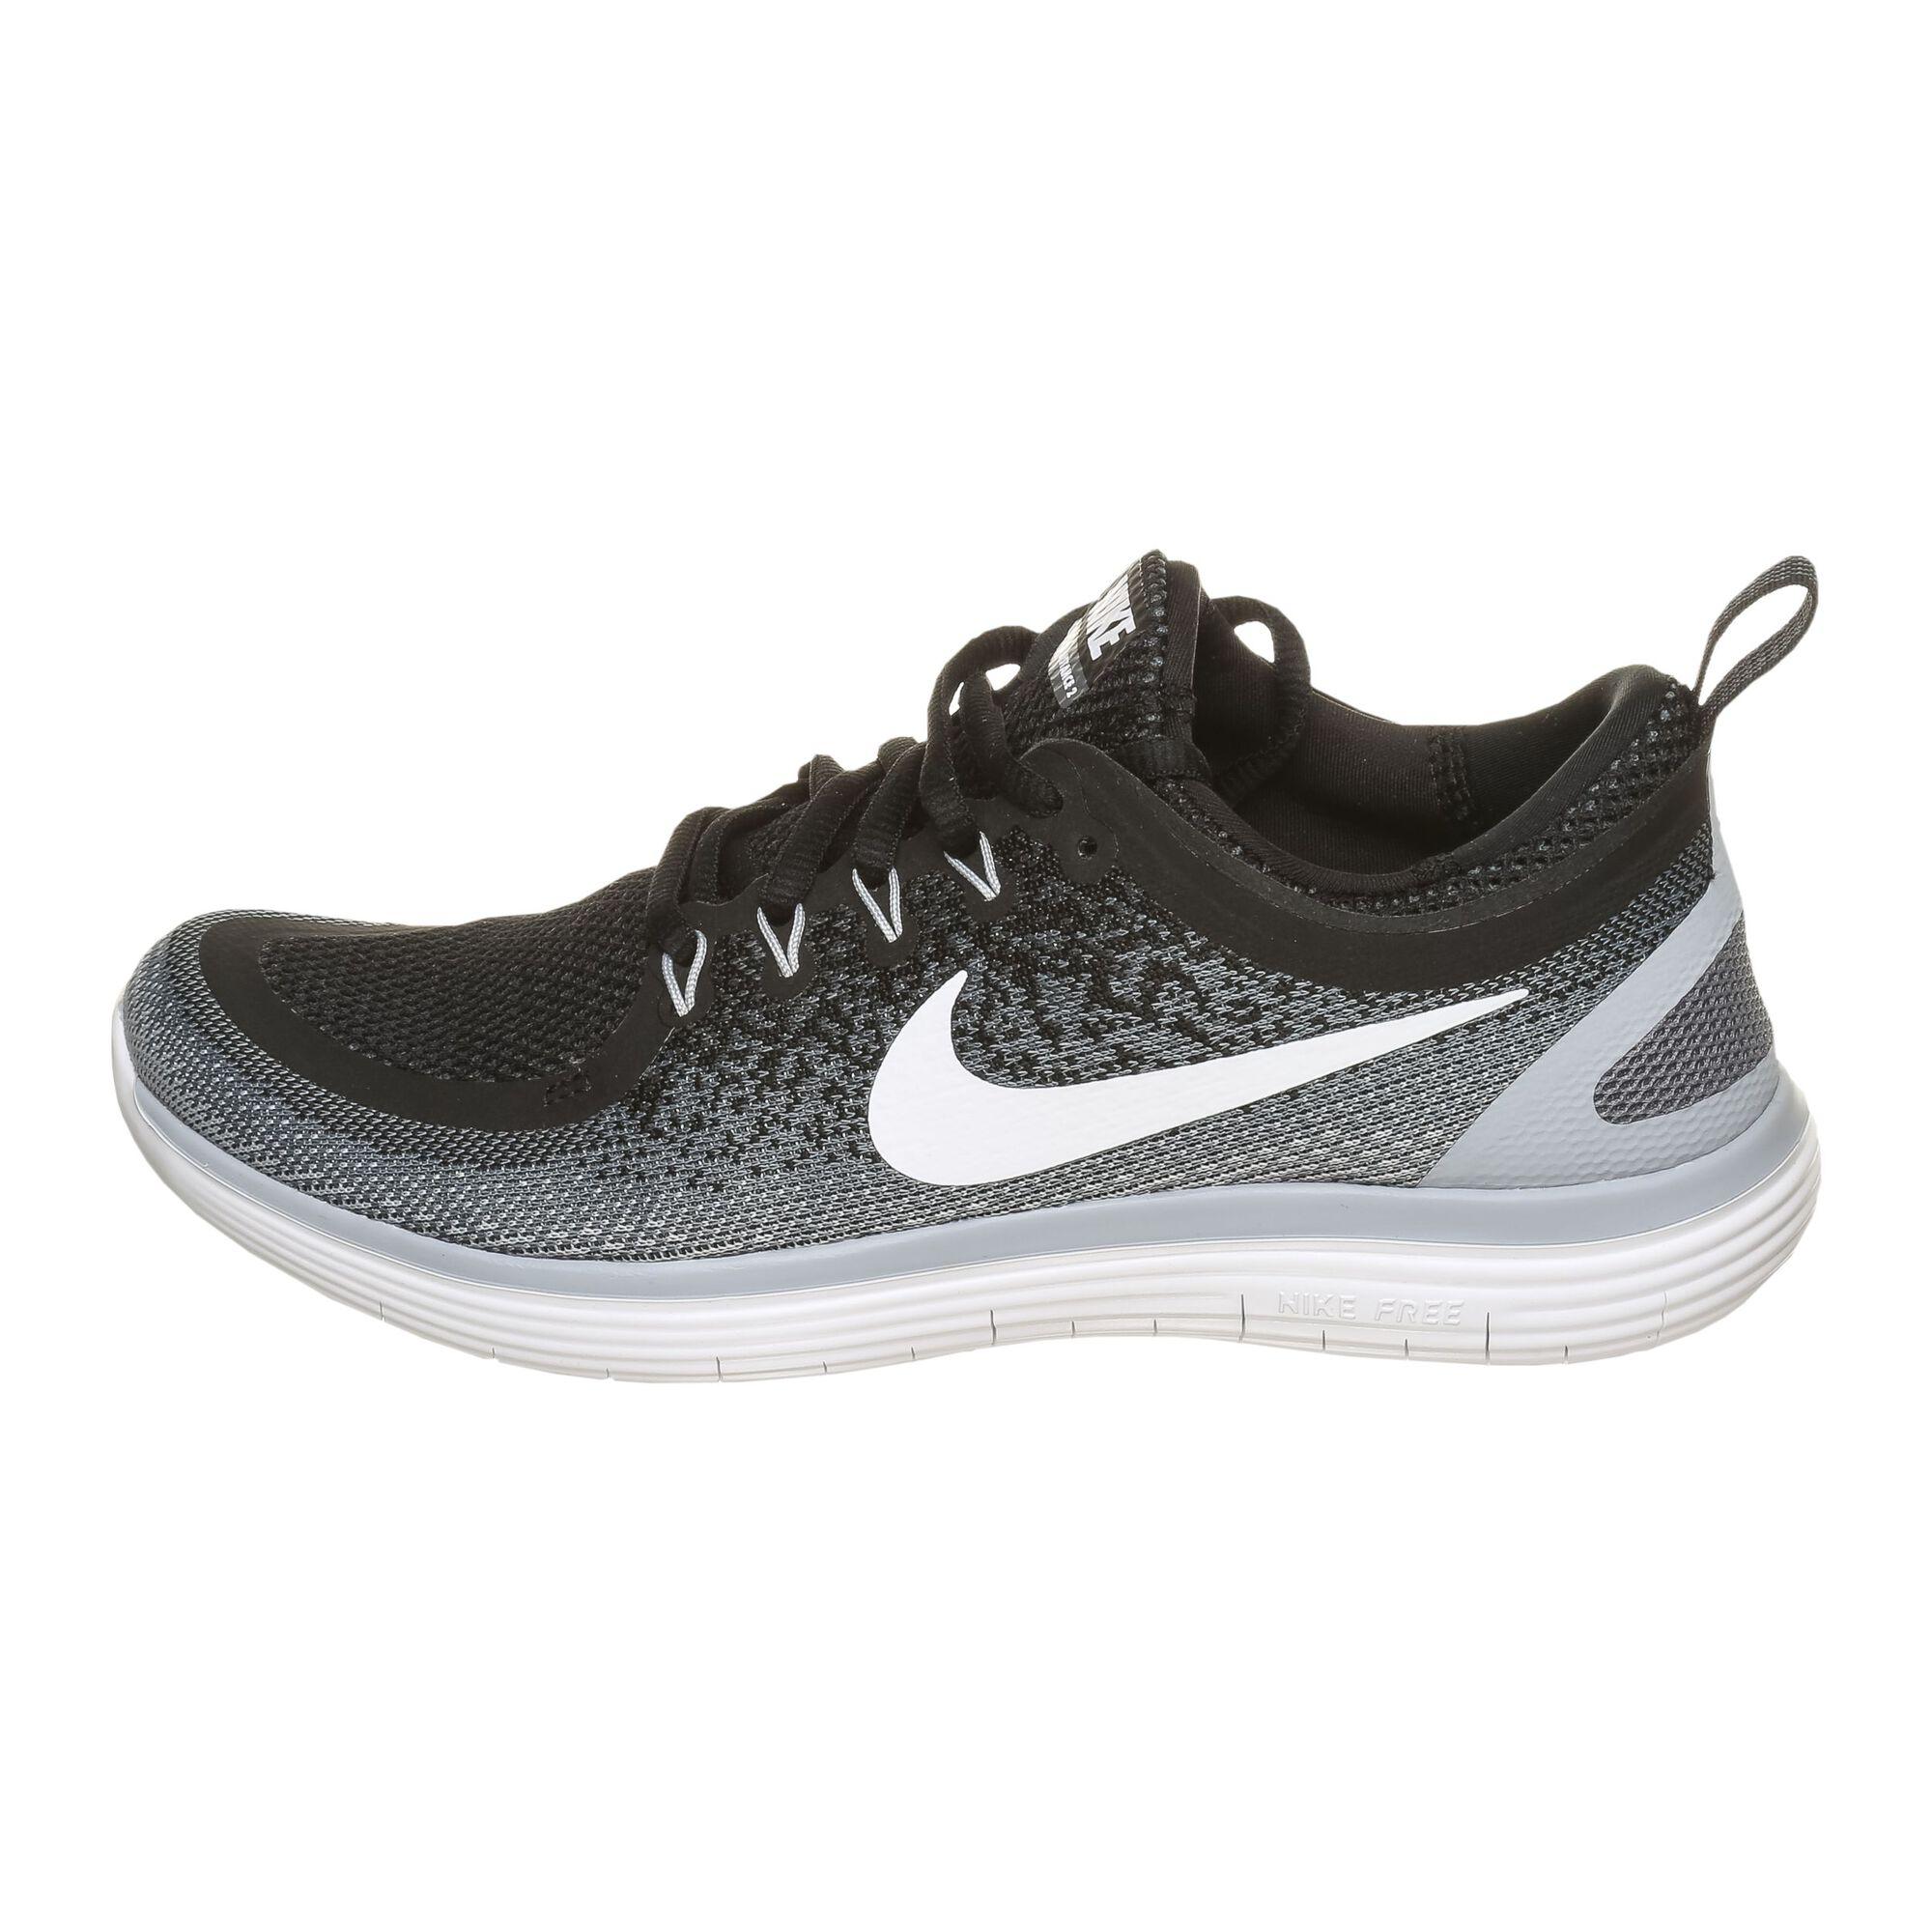 95aac4b55249f Nike  Nike  Nike  Nike  Nike  Nike  Nike  Nike  Nike  Nike. Nike Free RN  Distance 2 Women ...